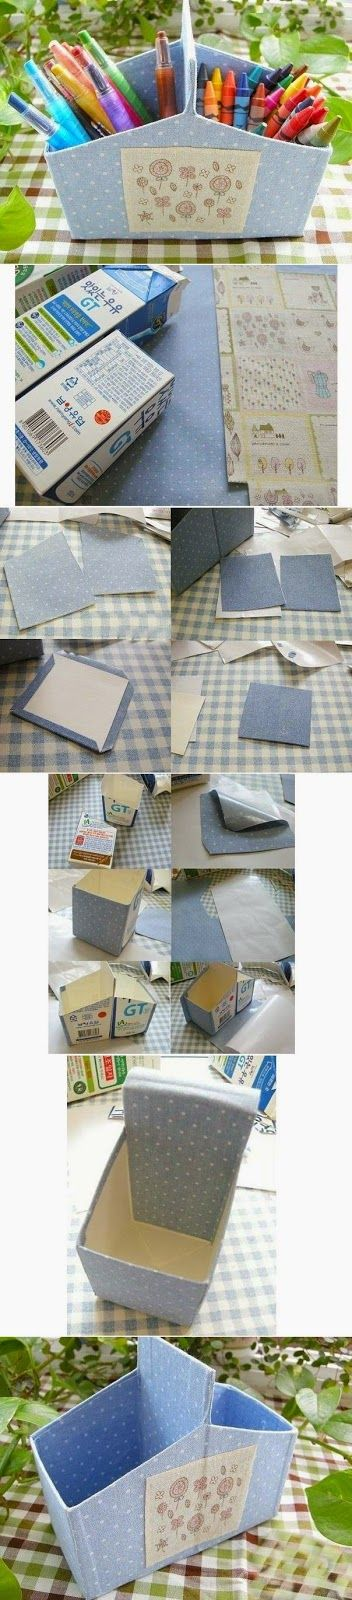 DIY Milk Carton Organizer